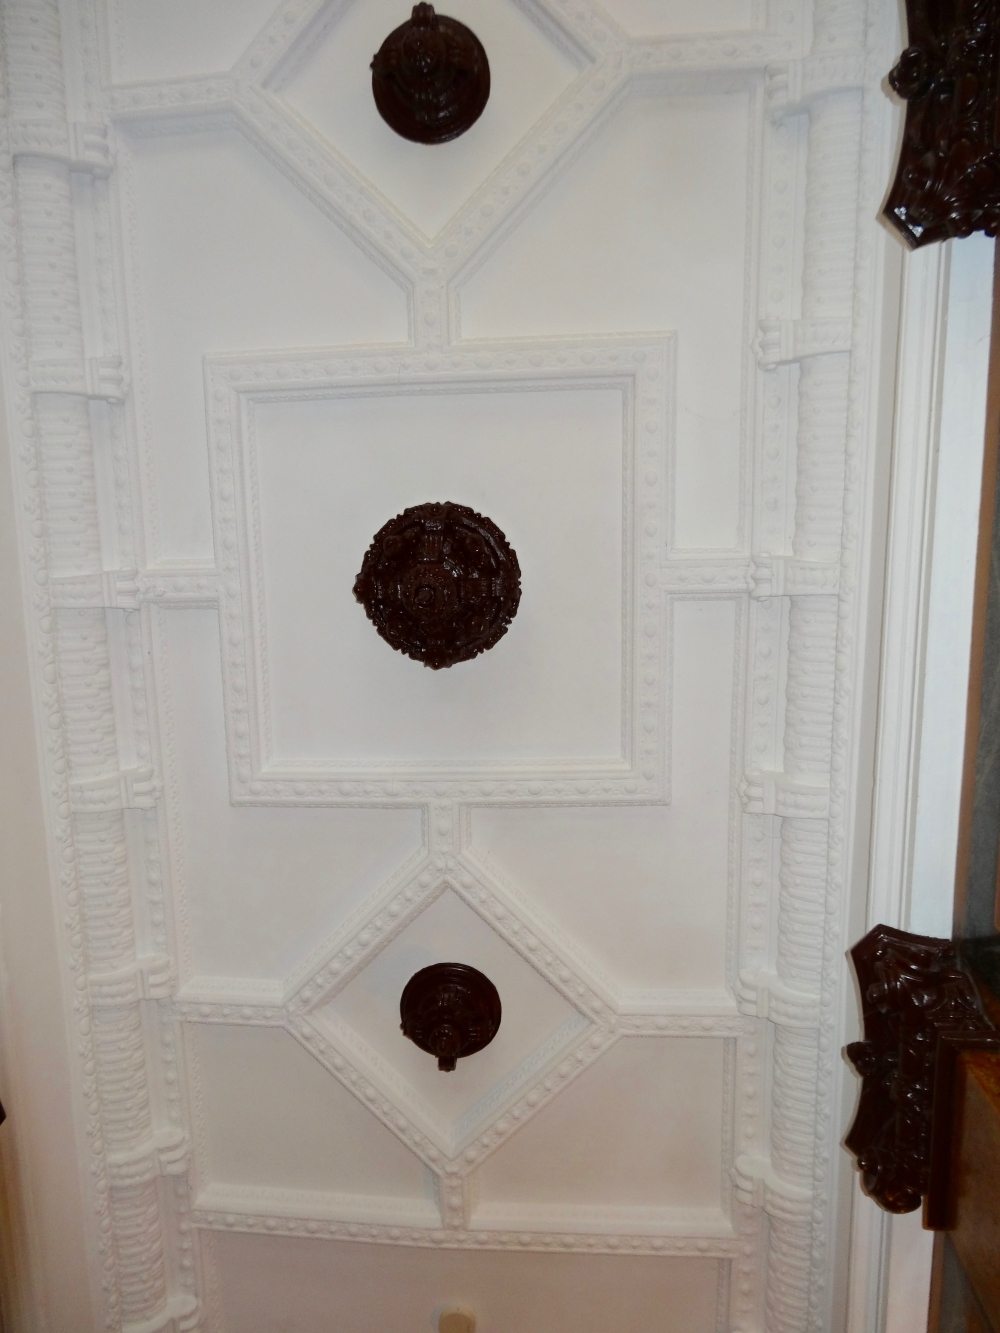 Stuckdecke Eingangshalle